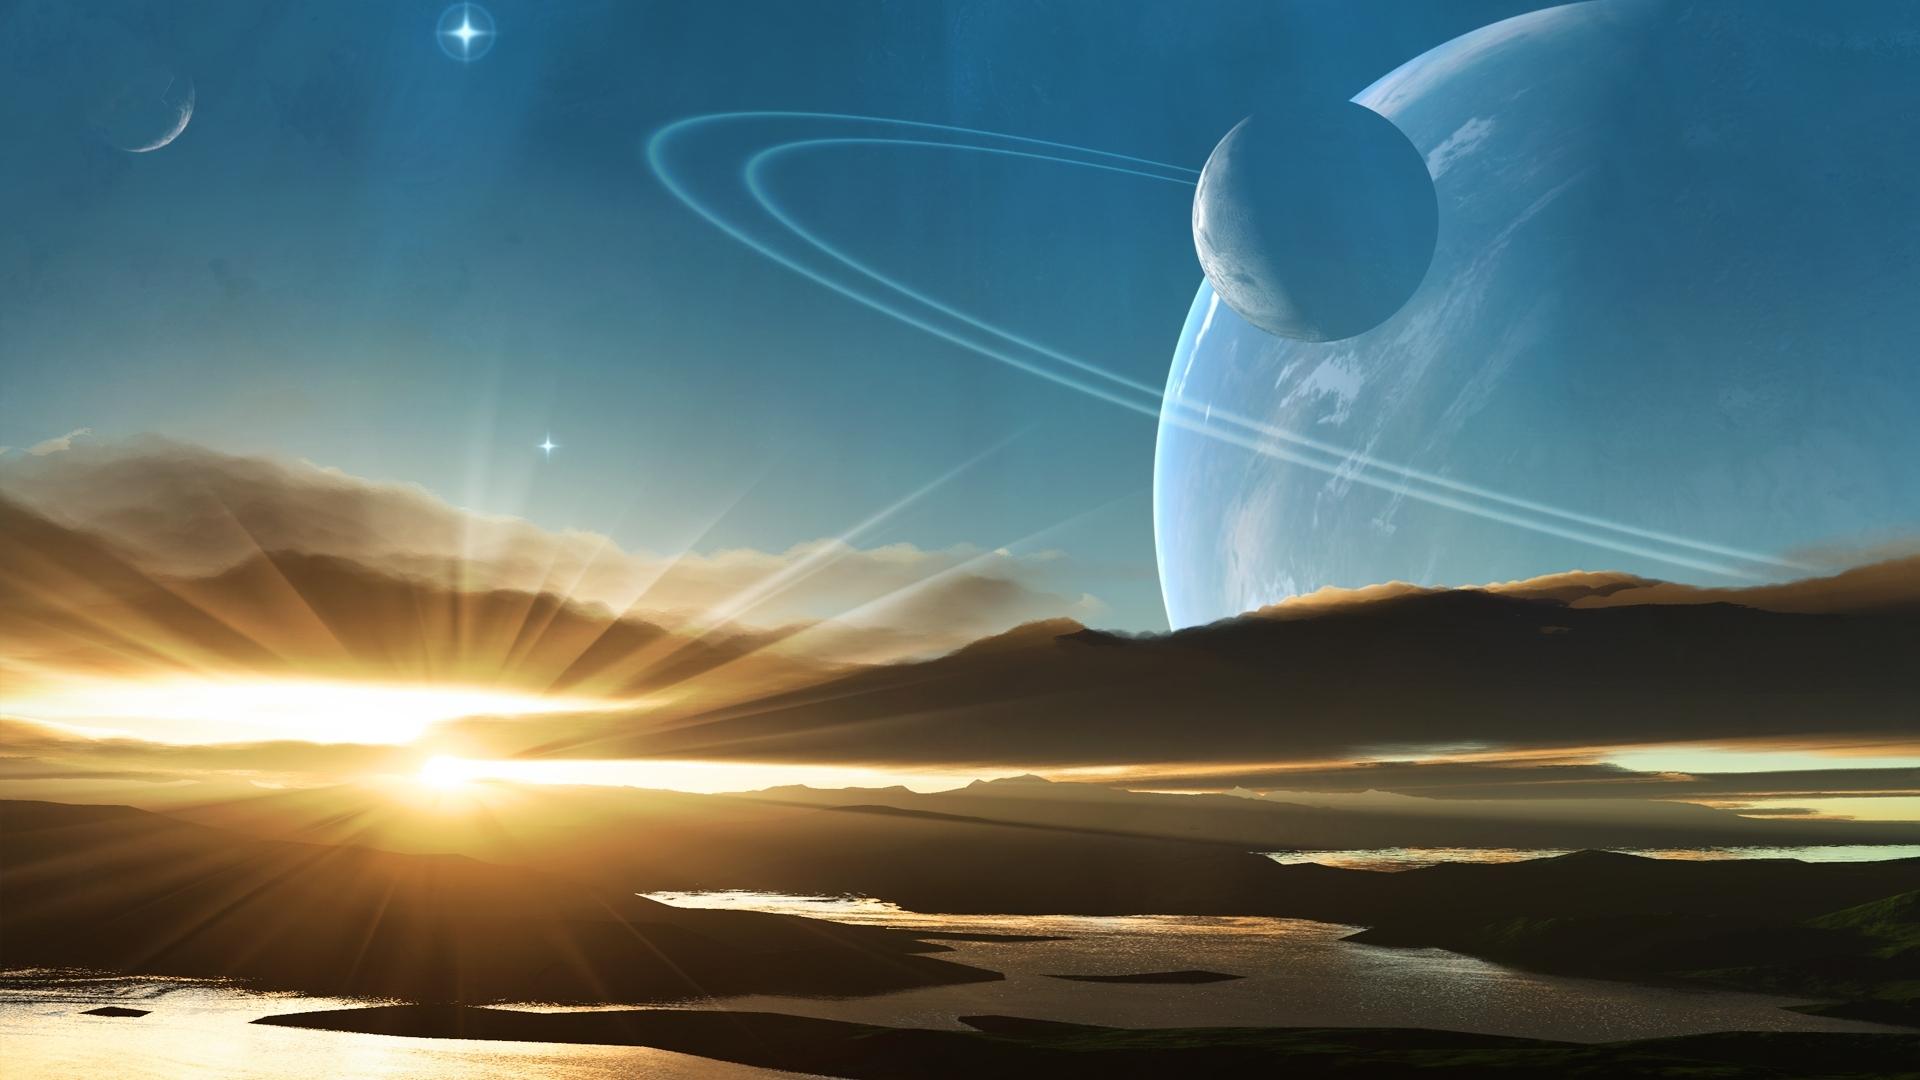 Wallpaper Planet Light Saturn Drawing 1920x1080